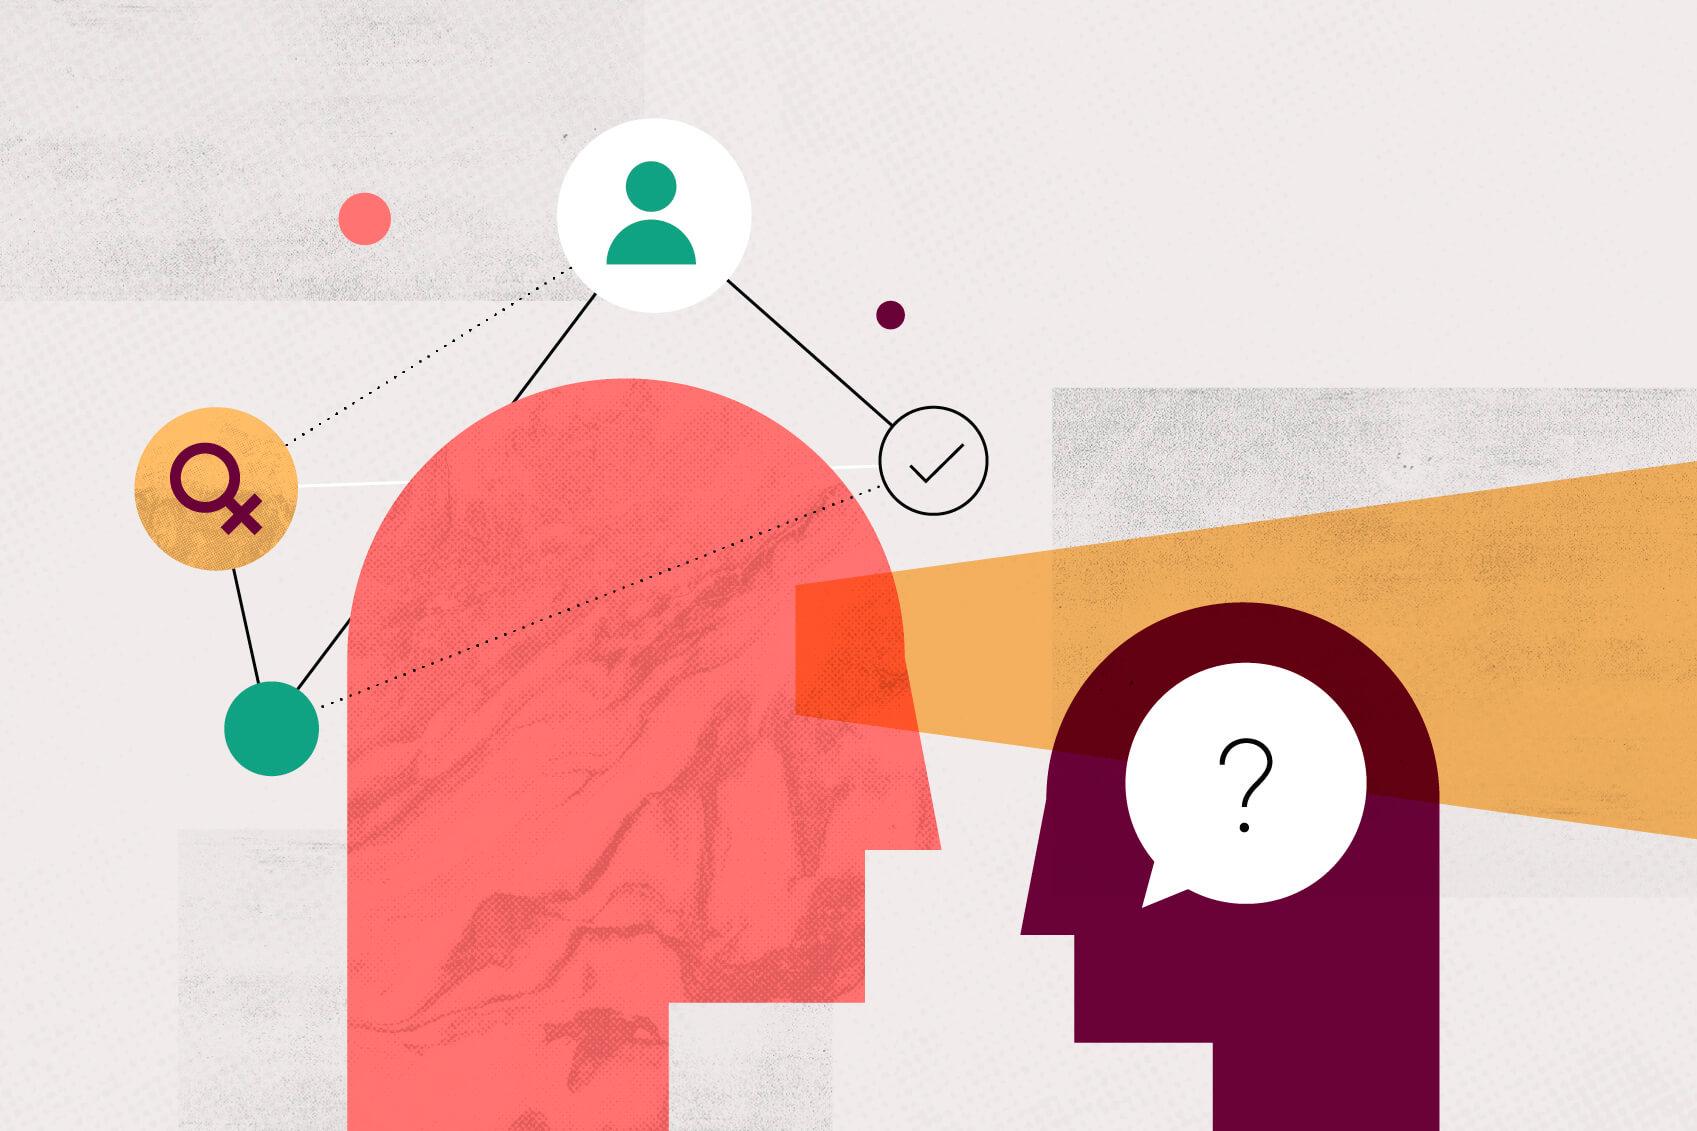 Unconscious bias examples